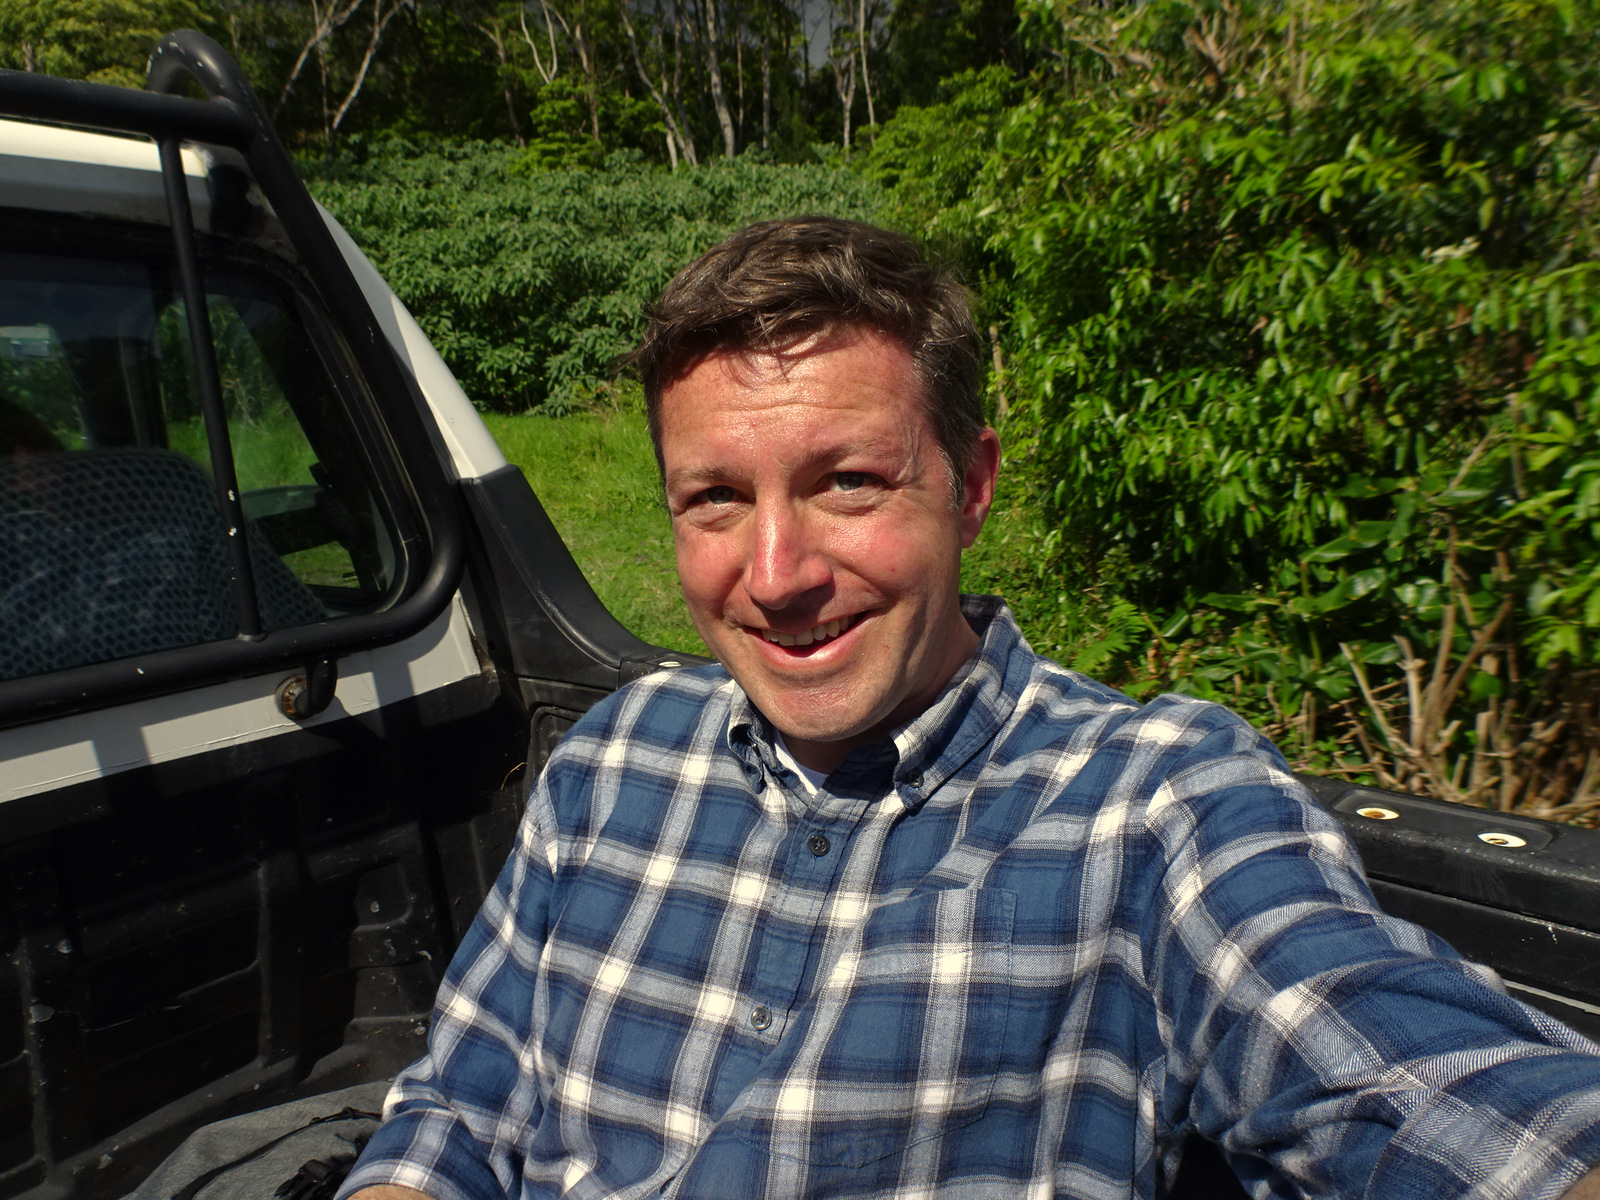 Andreas Moser Pico hitchhiking pick-up (1)